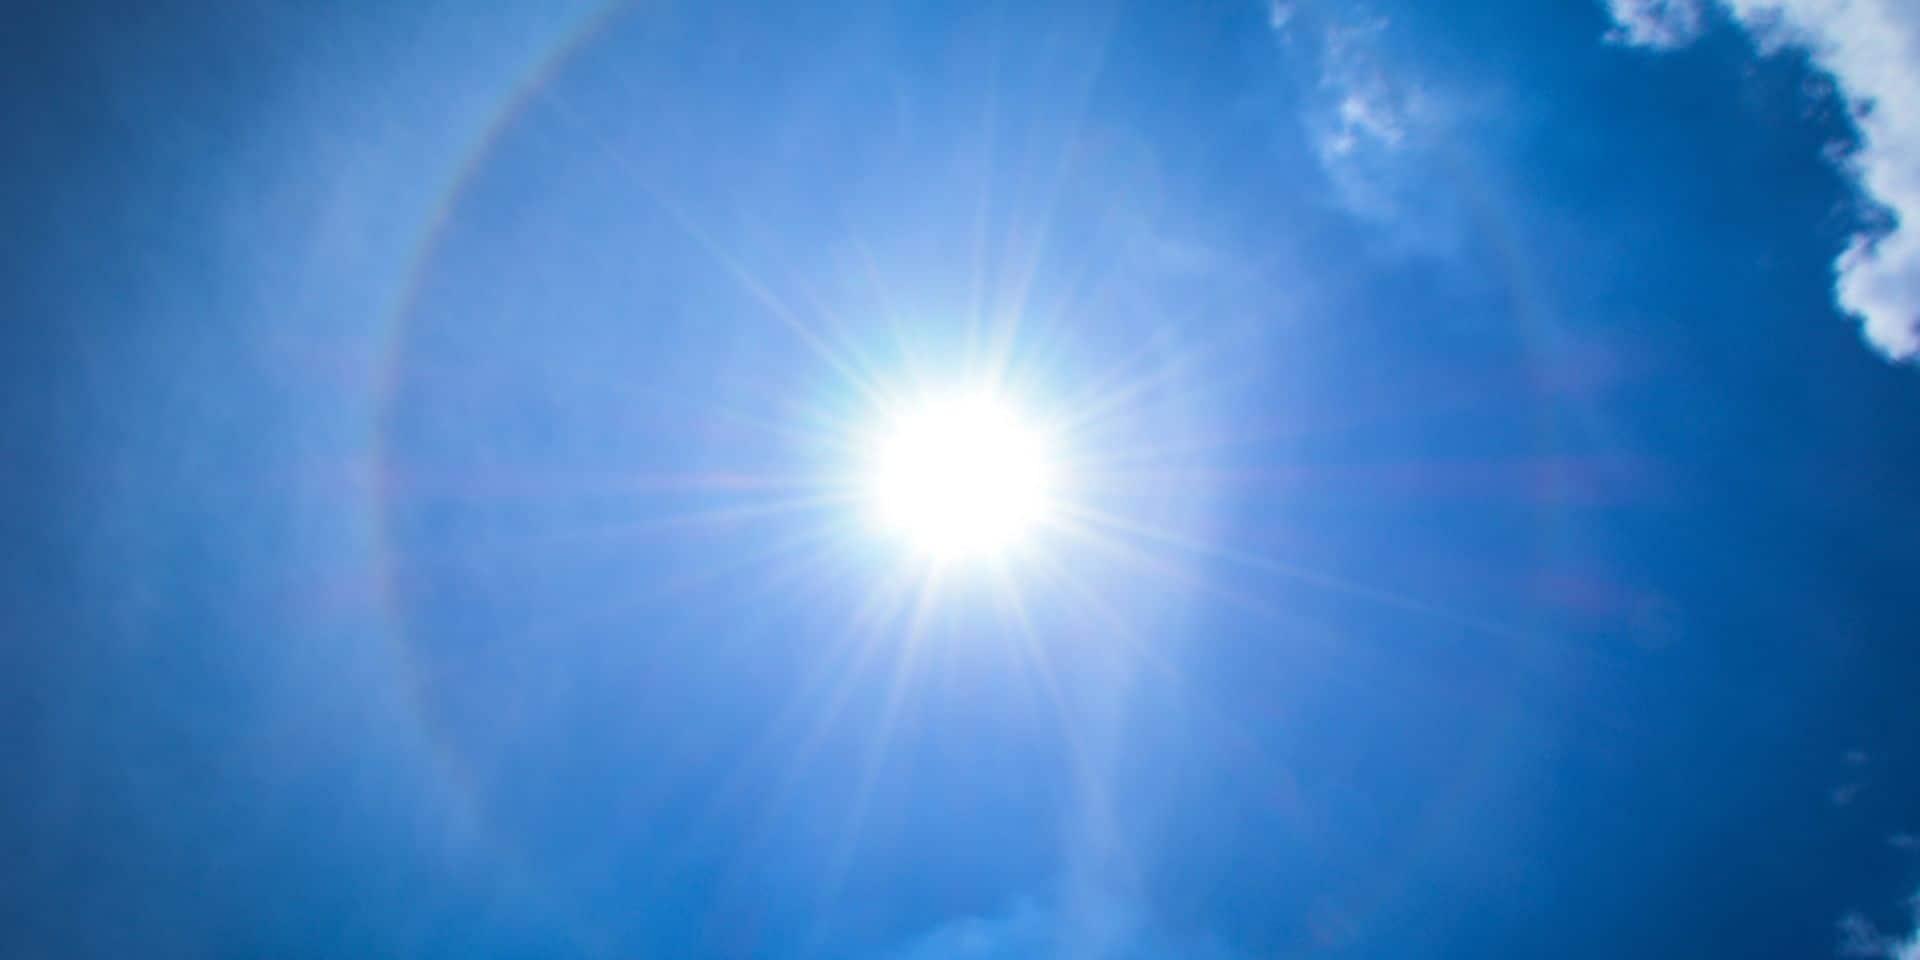 Météo: le mercure va grimper jusqu'à 33 degrés mercredi